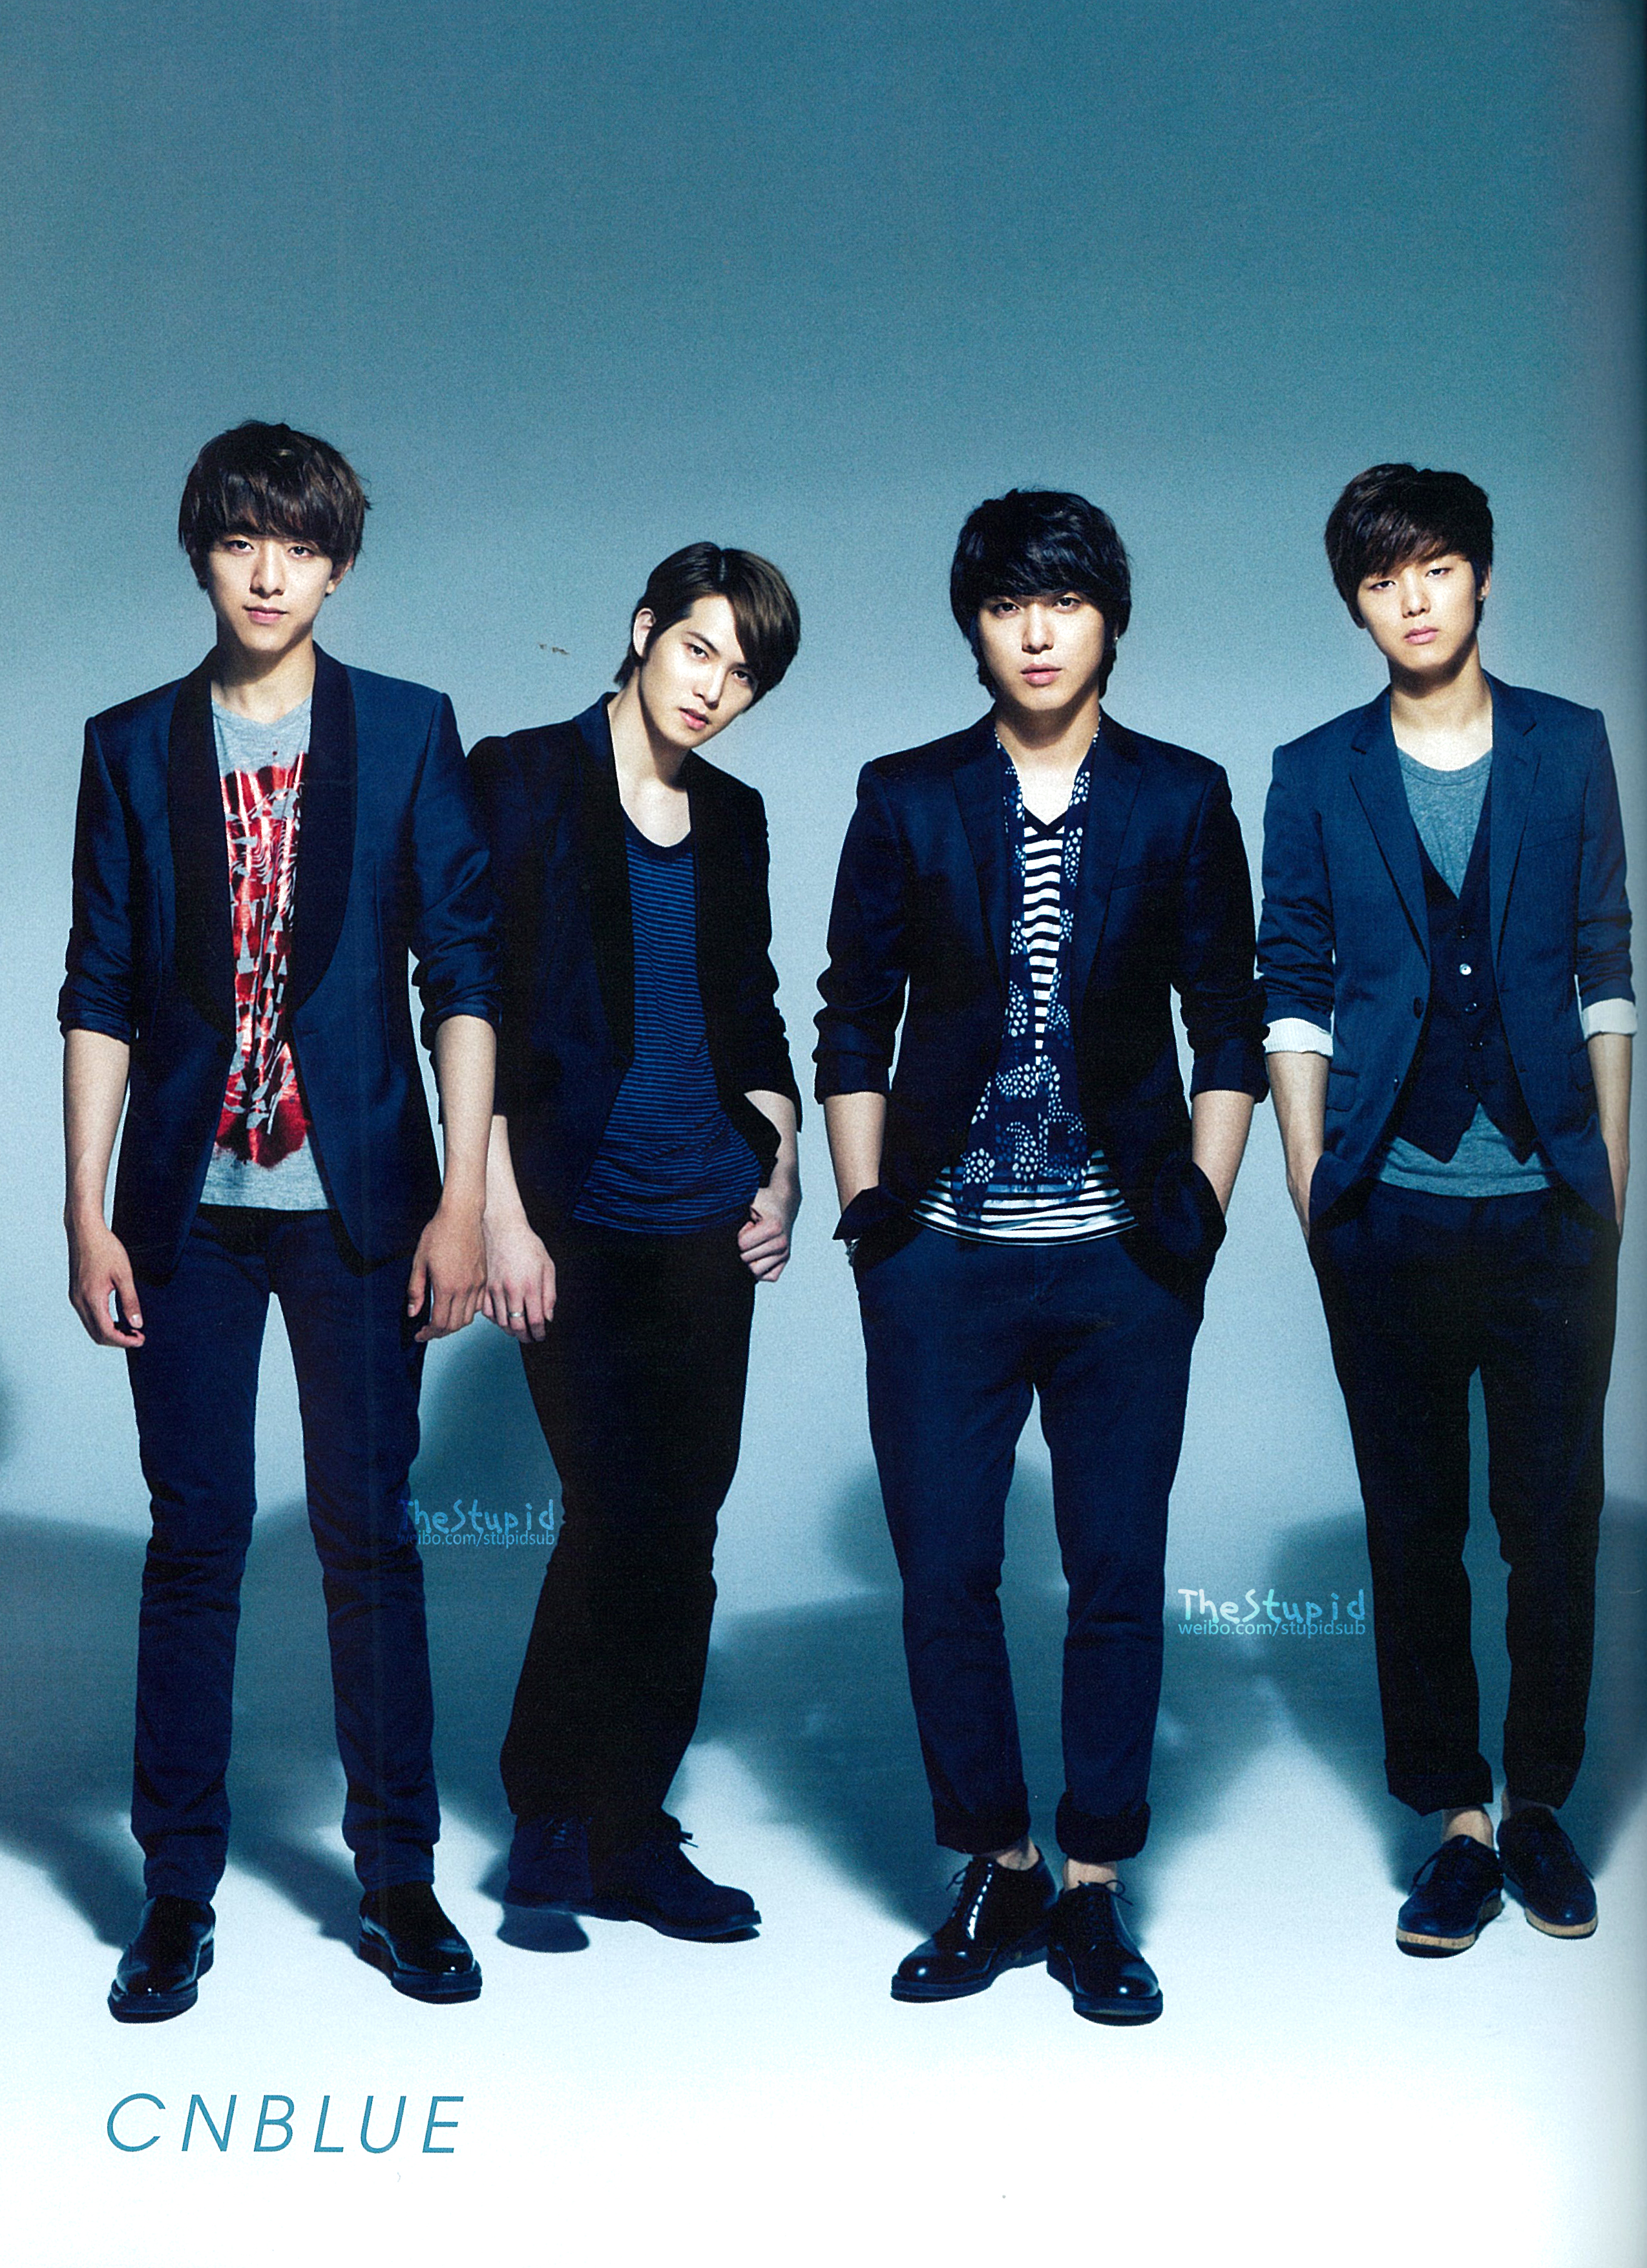 Картинки корейских группы